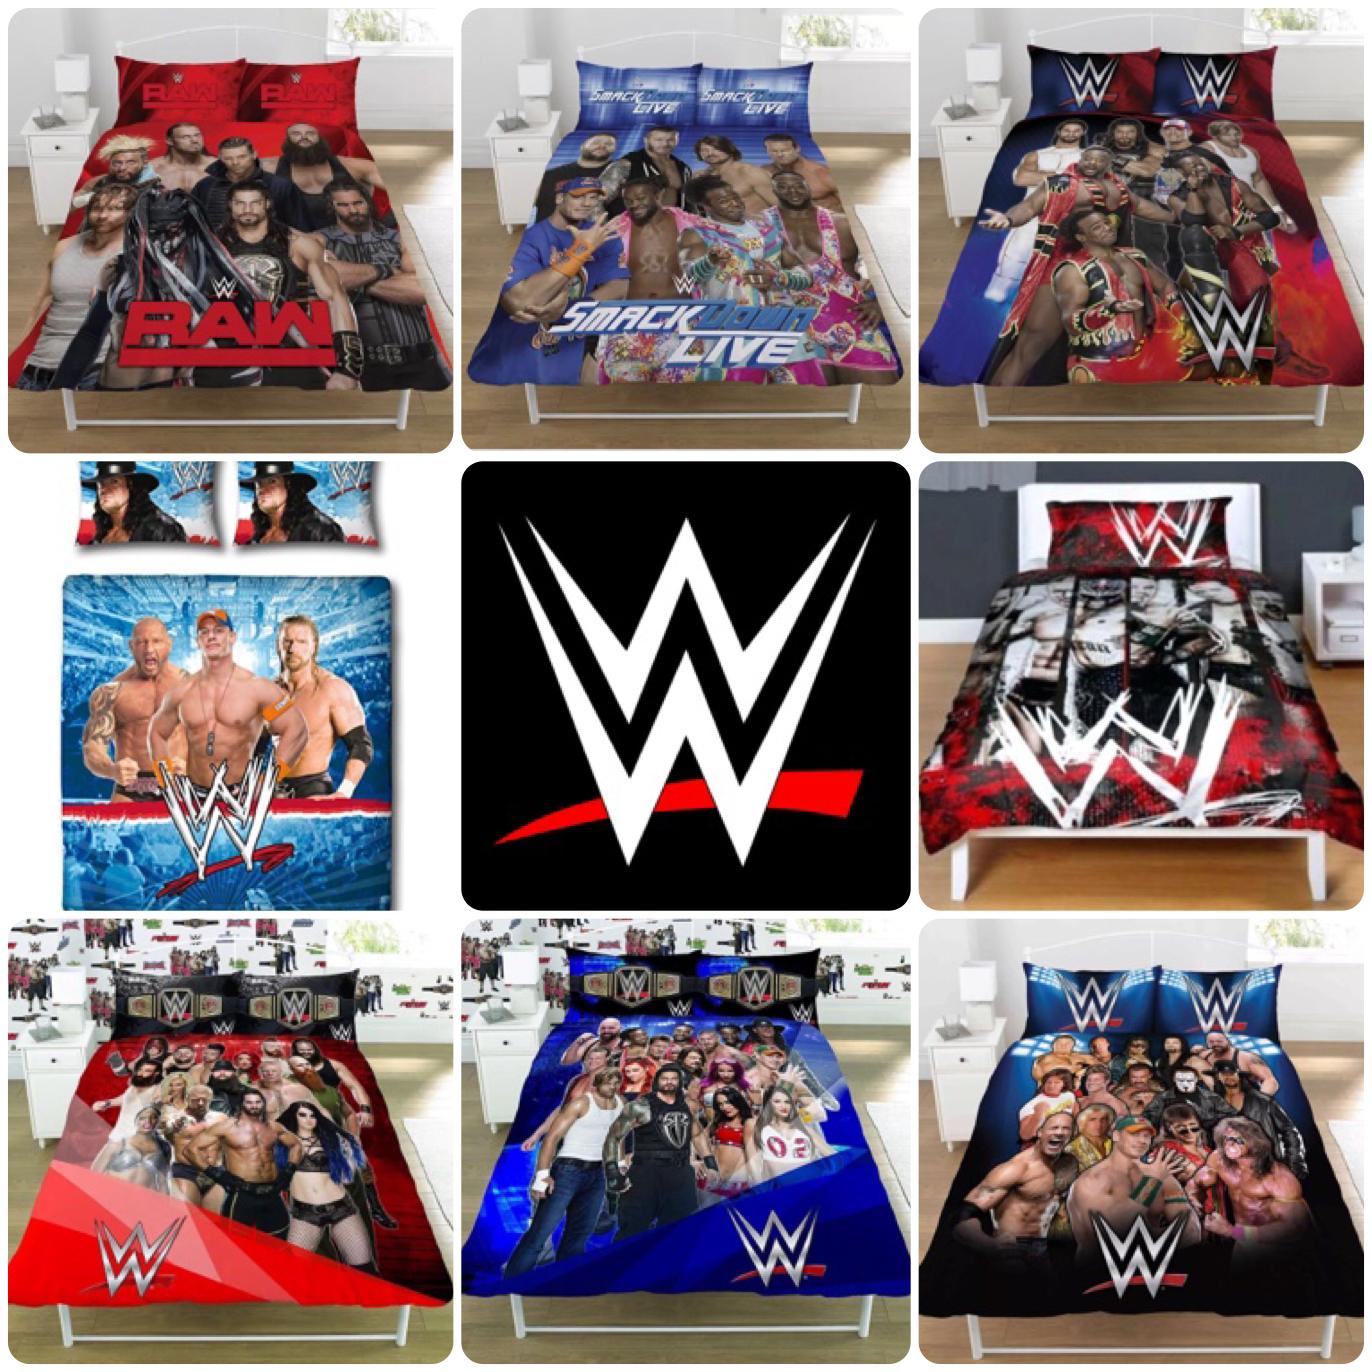 WWE Legends Wrestling Face vs Heel Smackdown Raw Bedding Set